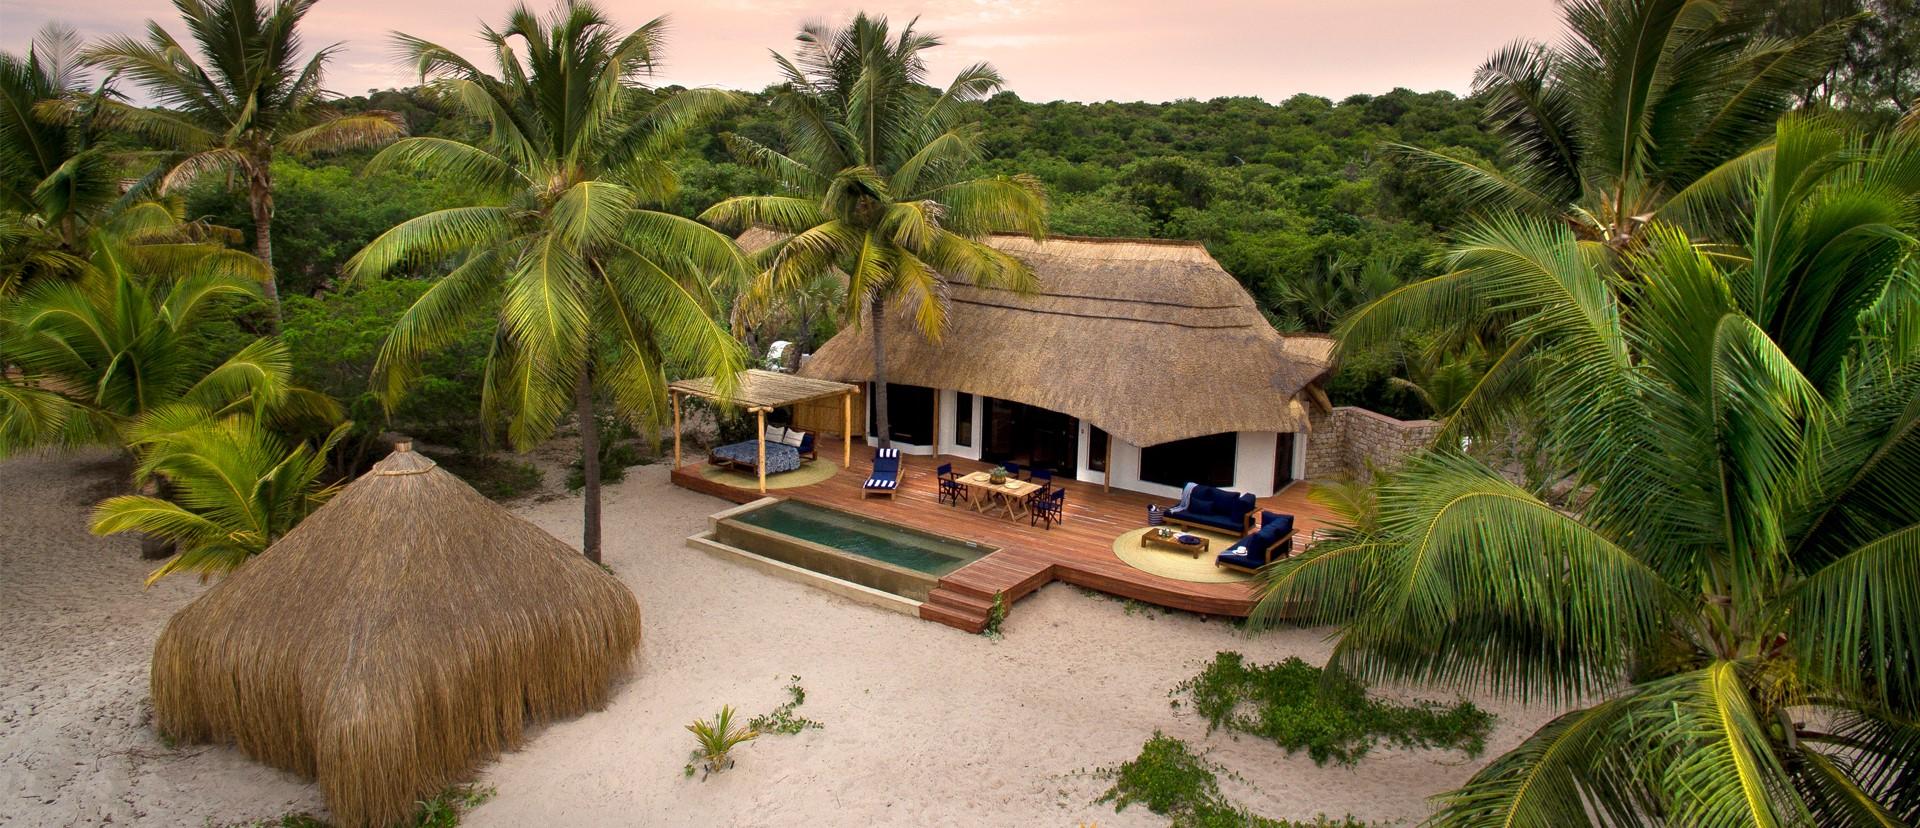 andBeyondBenguerra-Island-Mozambique